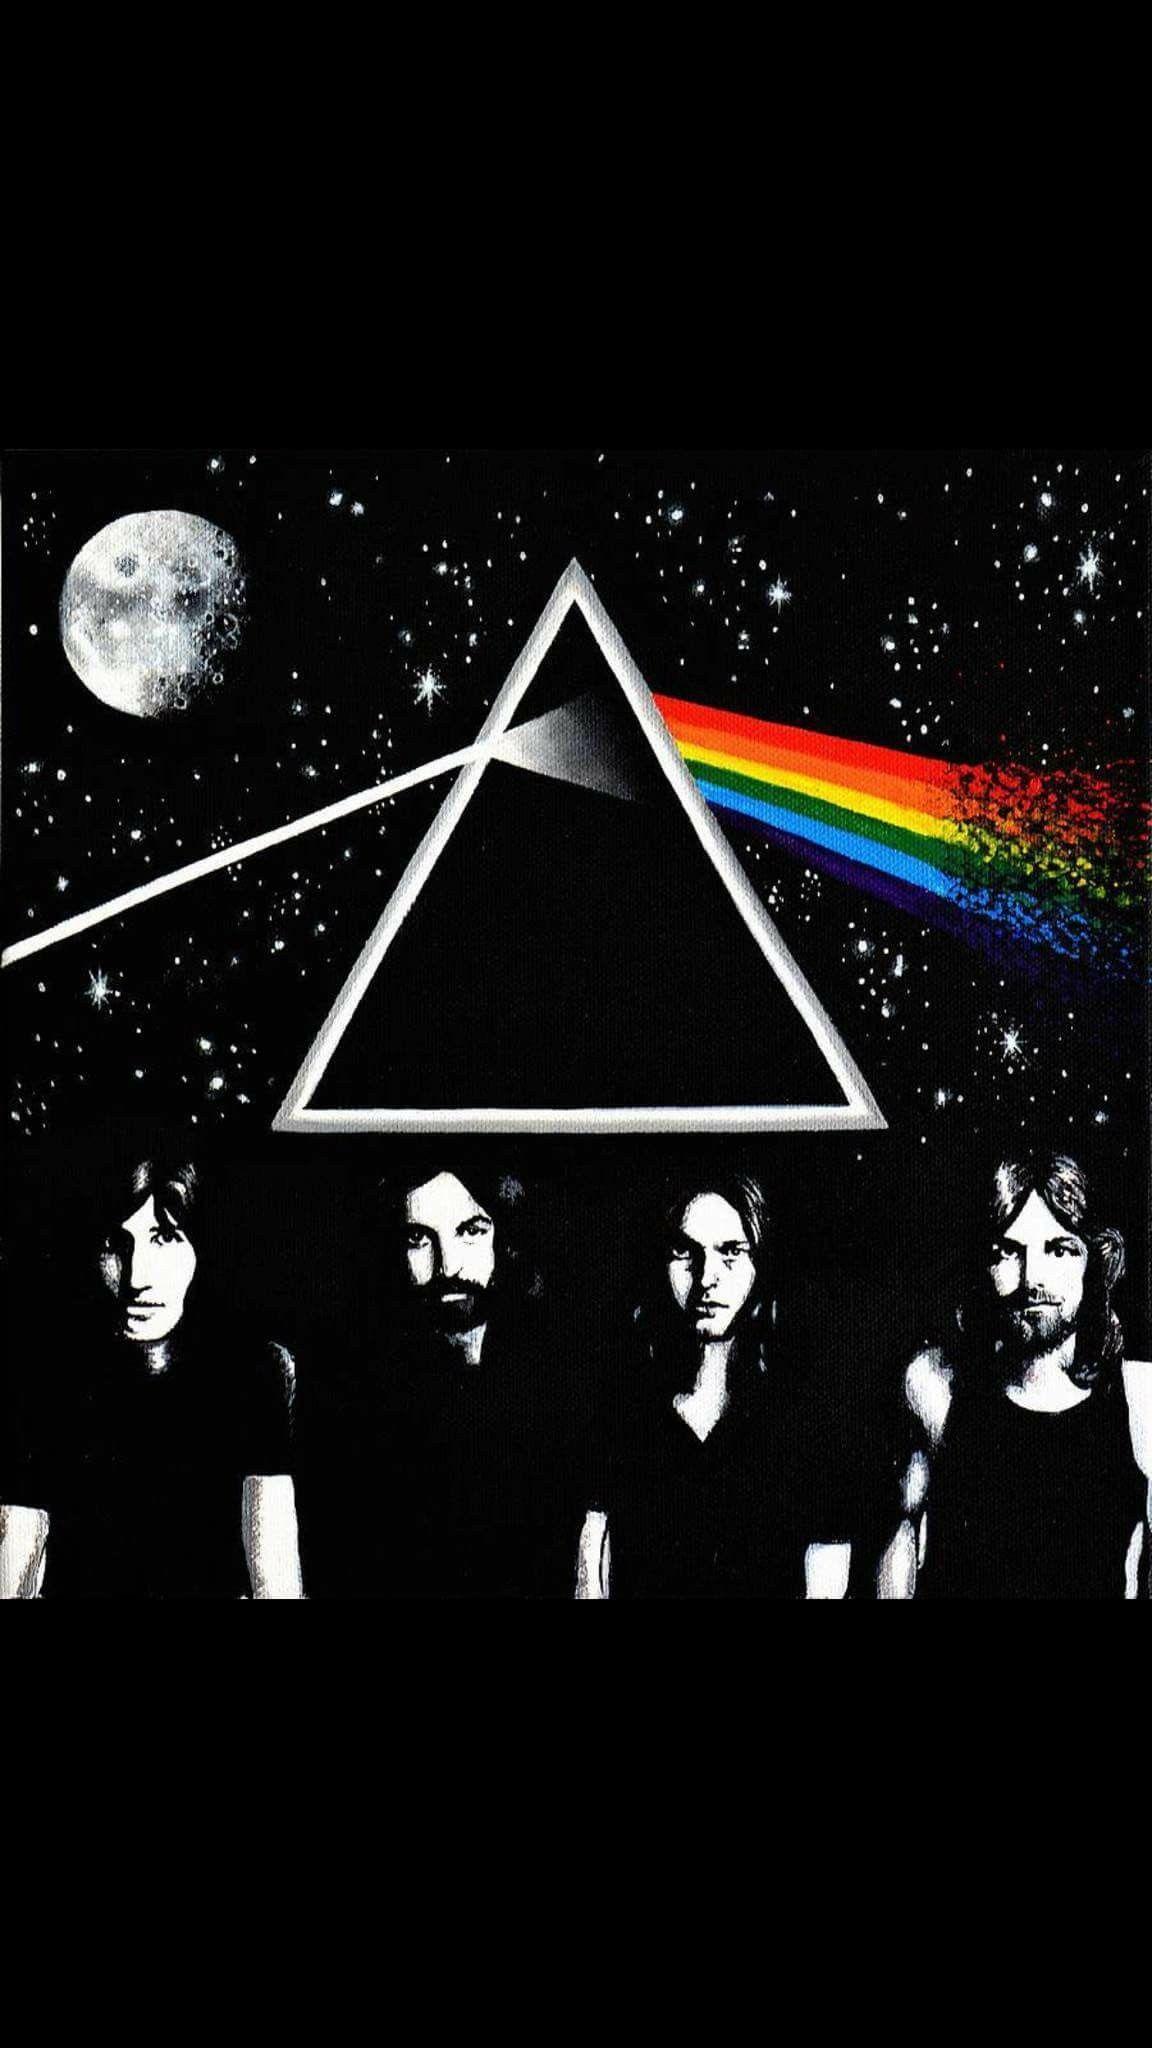 Pink Floyd 2019 Wallpapers - Wallpaper Cave